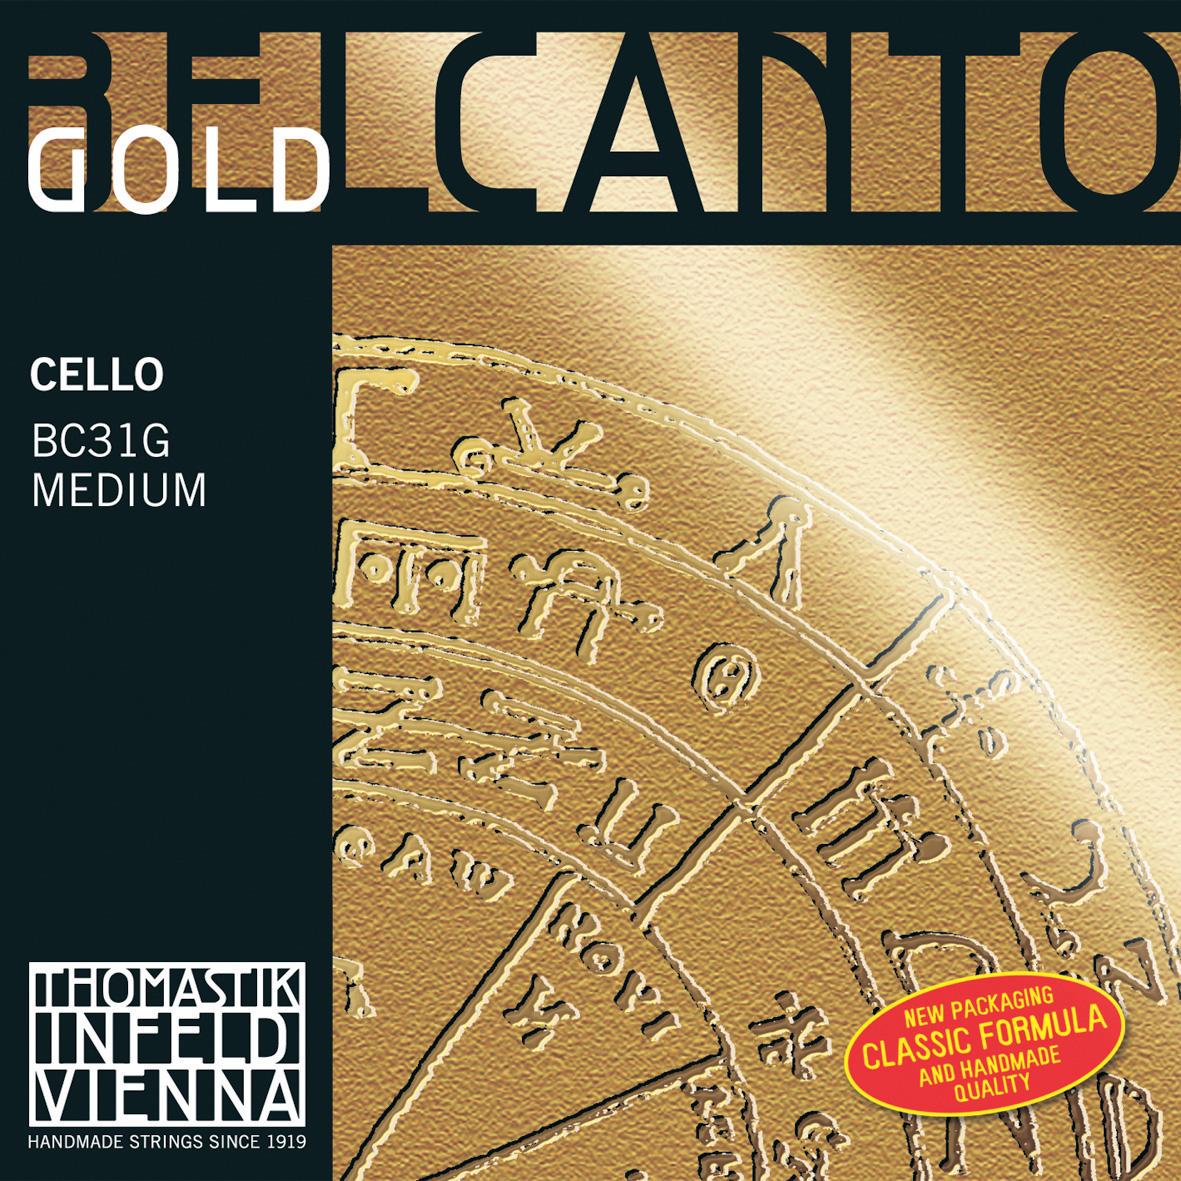 Belcanto-strings